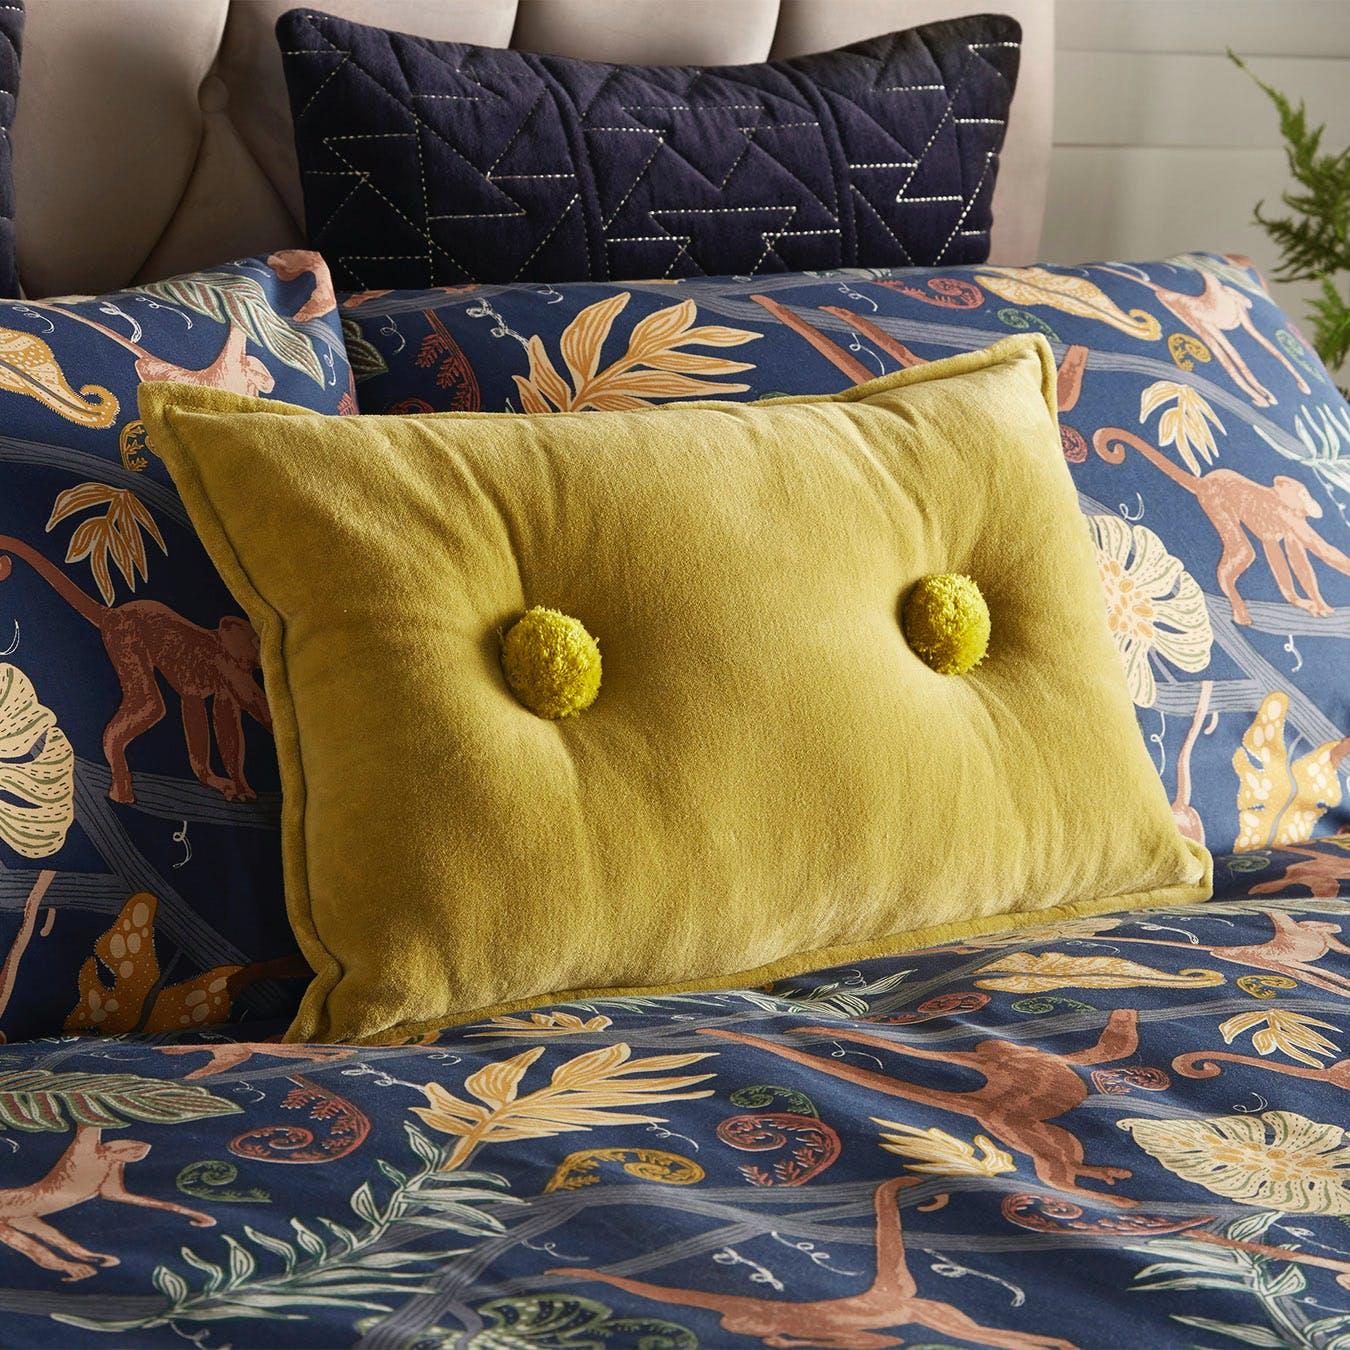 Monkey Bedding in Bedding Sets & Duvet